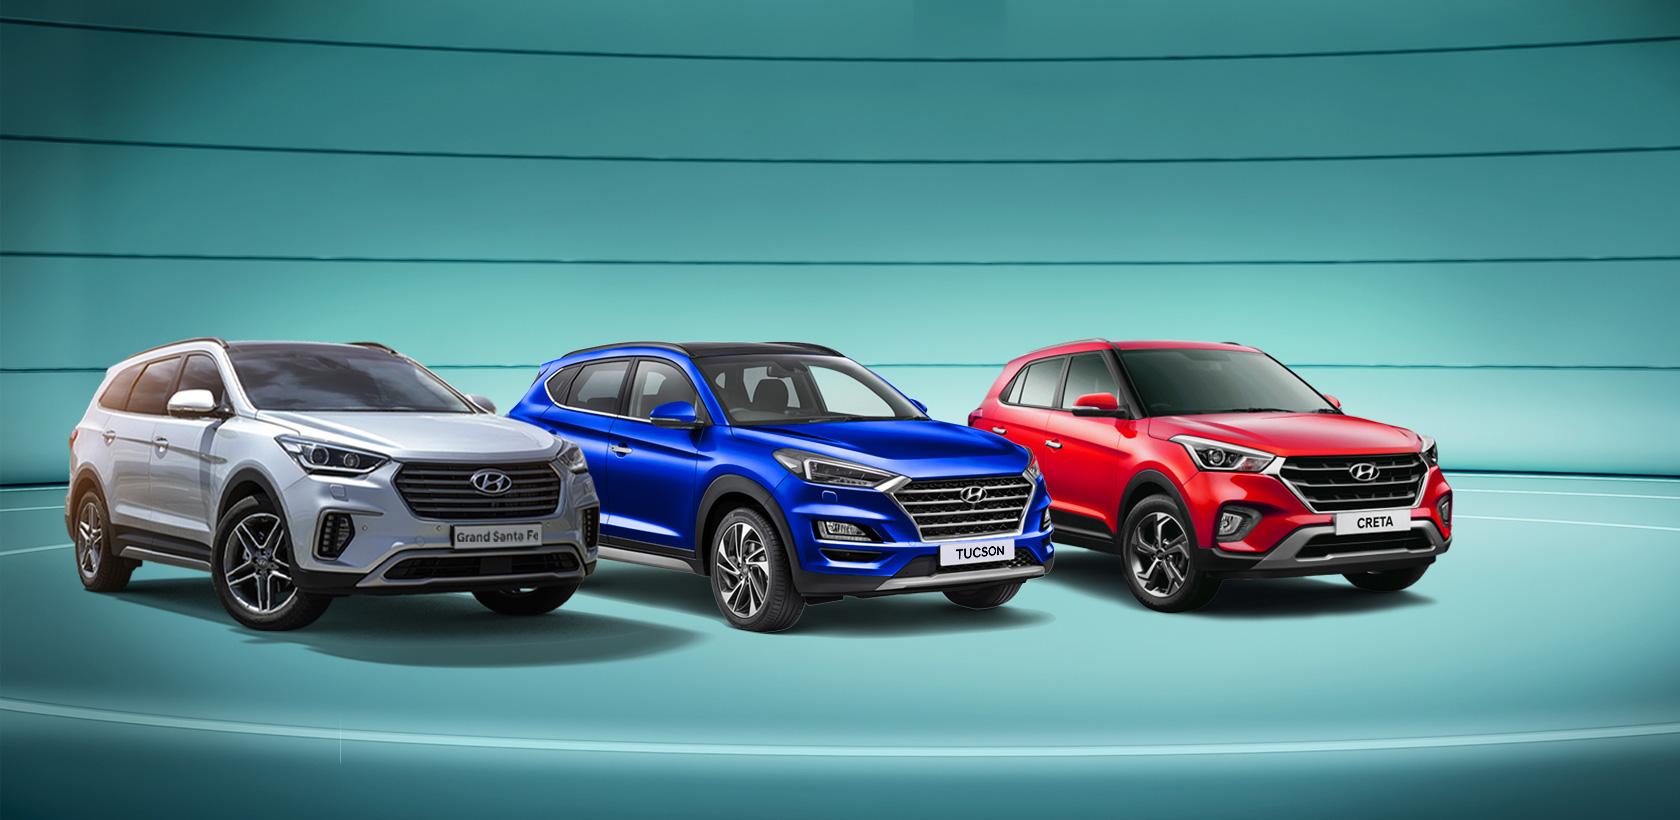 Hyundai leader des ventes en Février